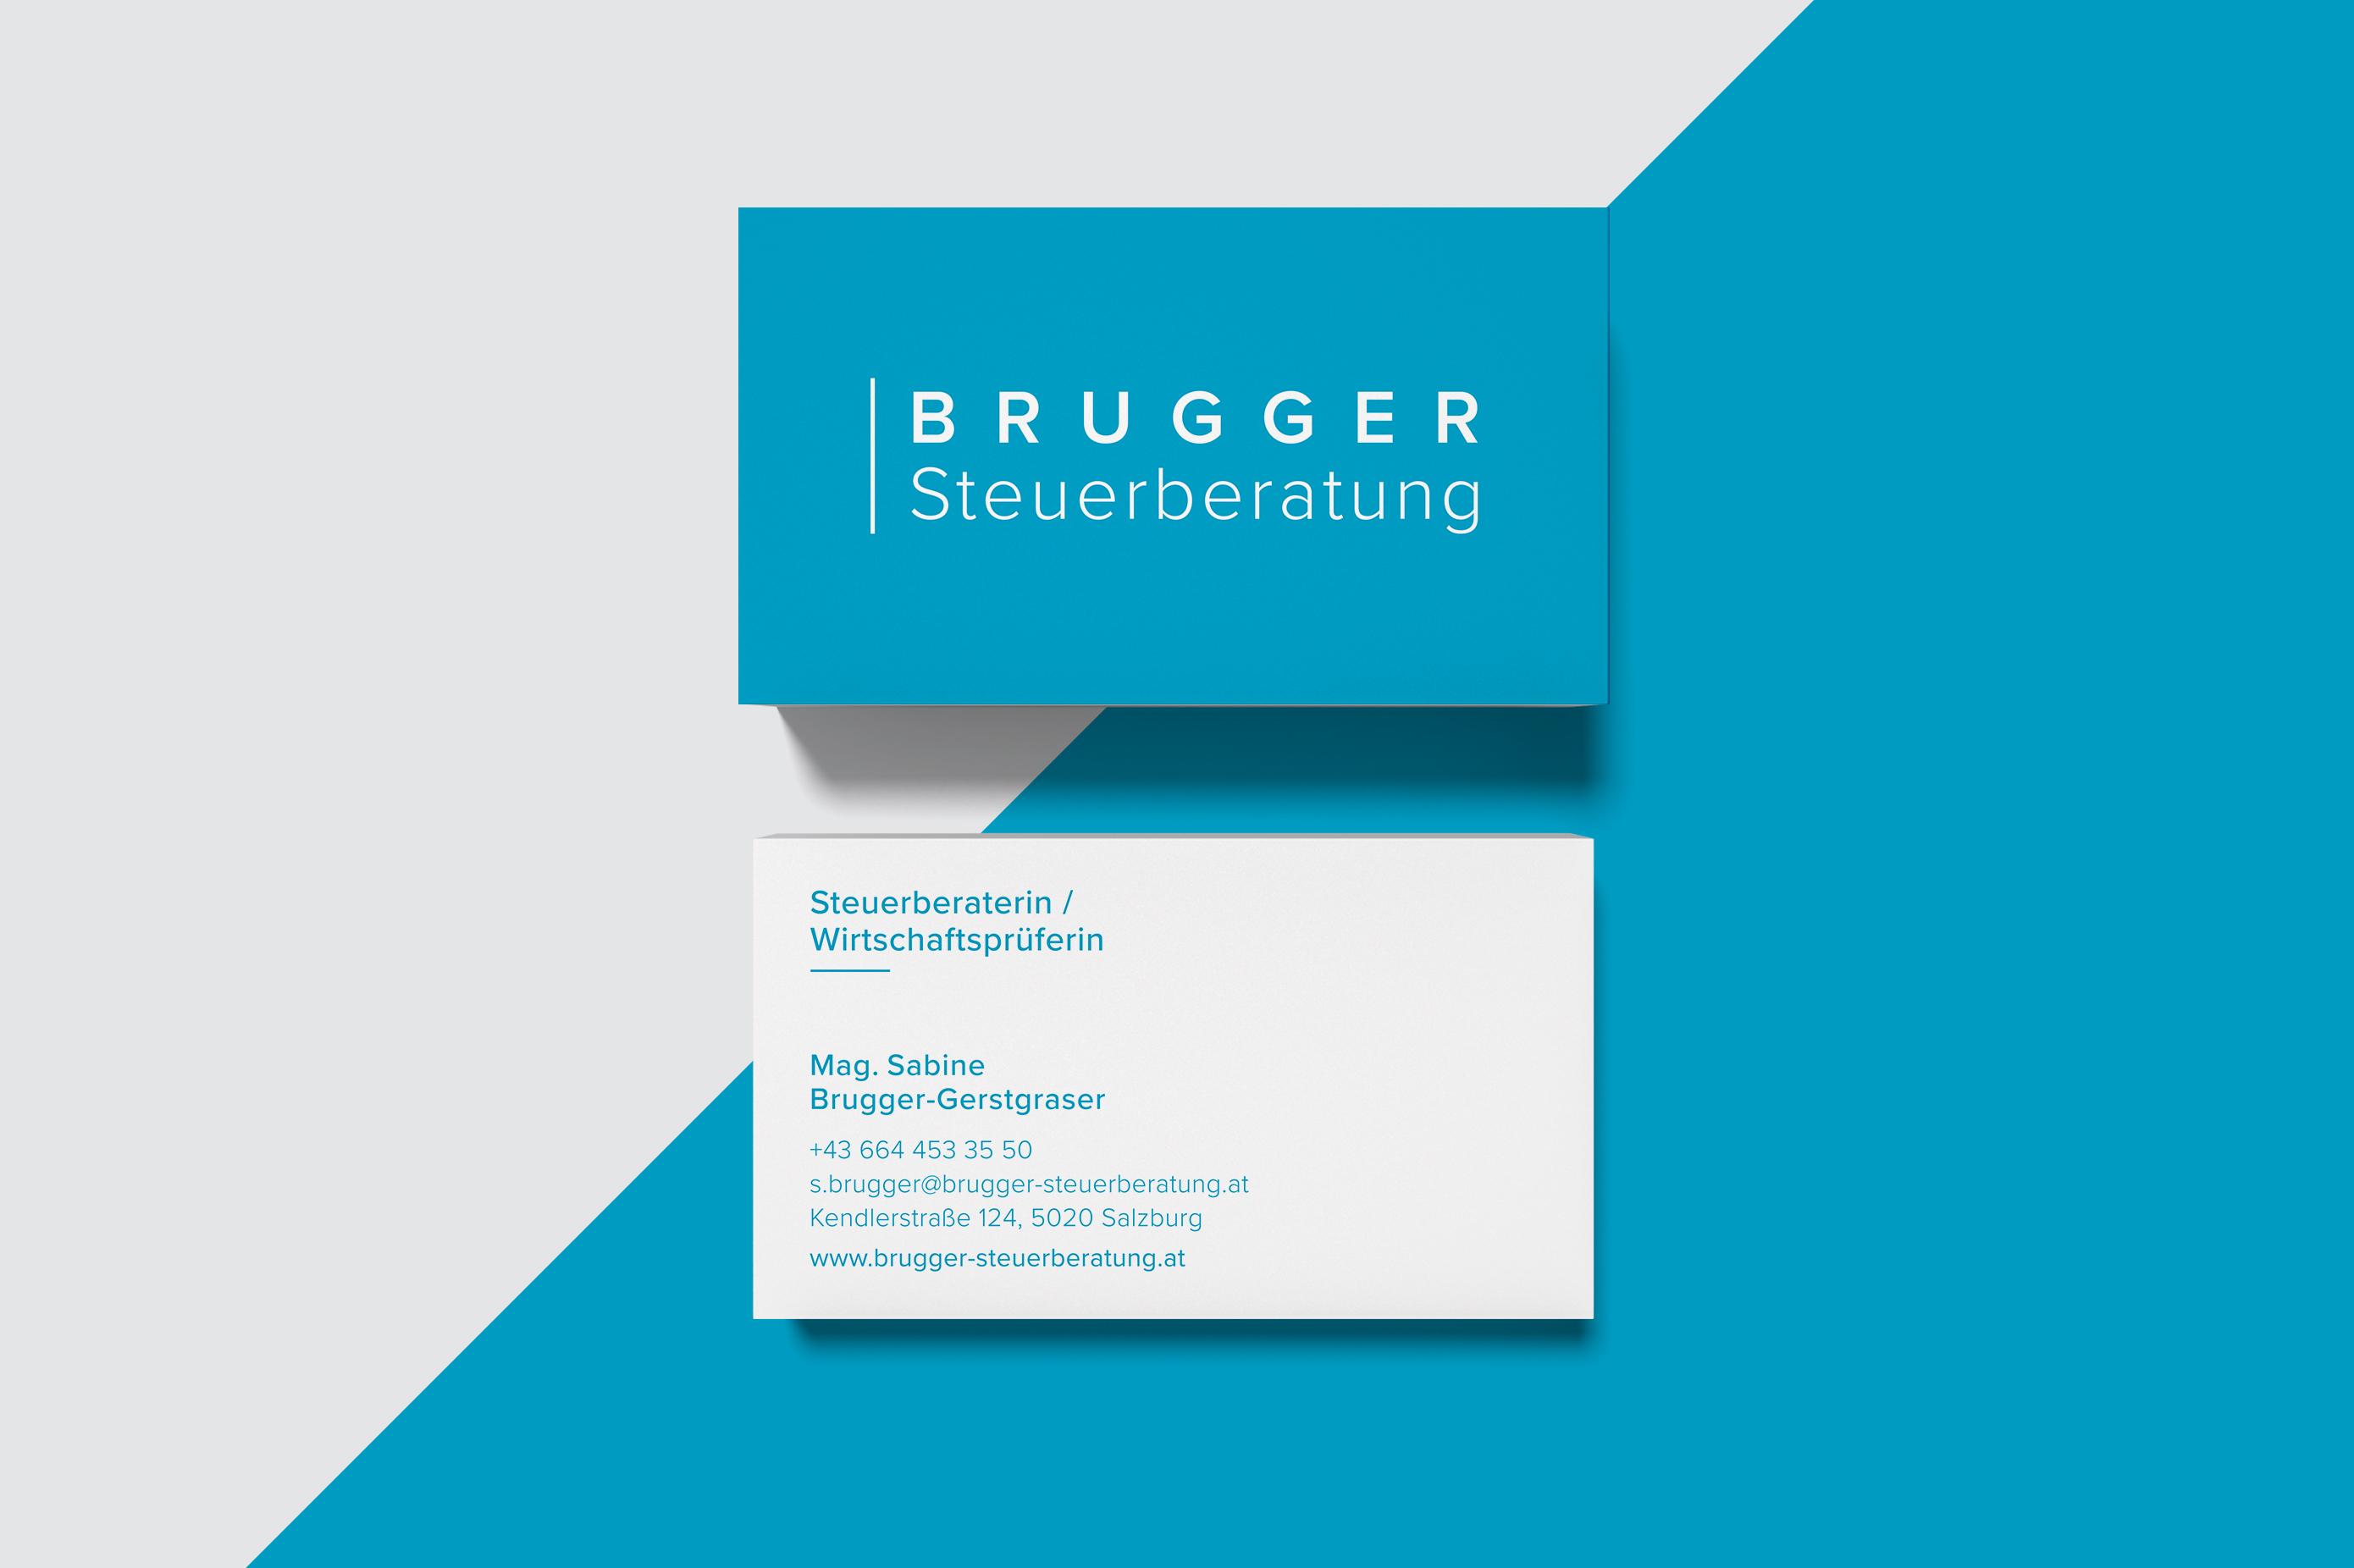 Brugger_Steuerberatung_business_cards